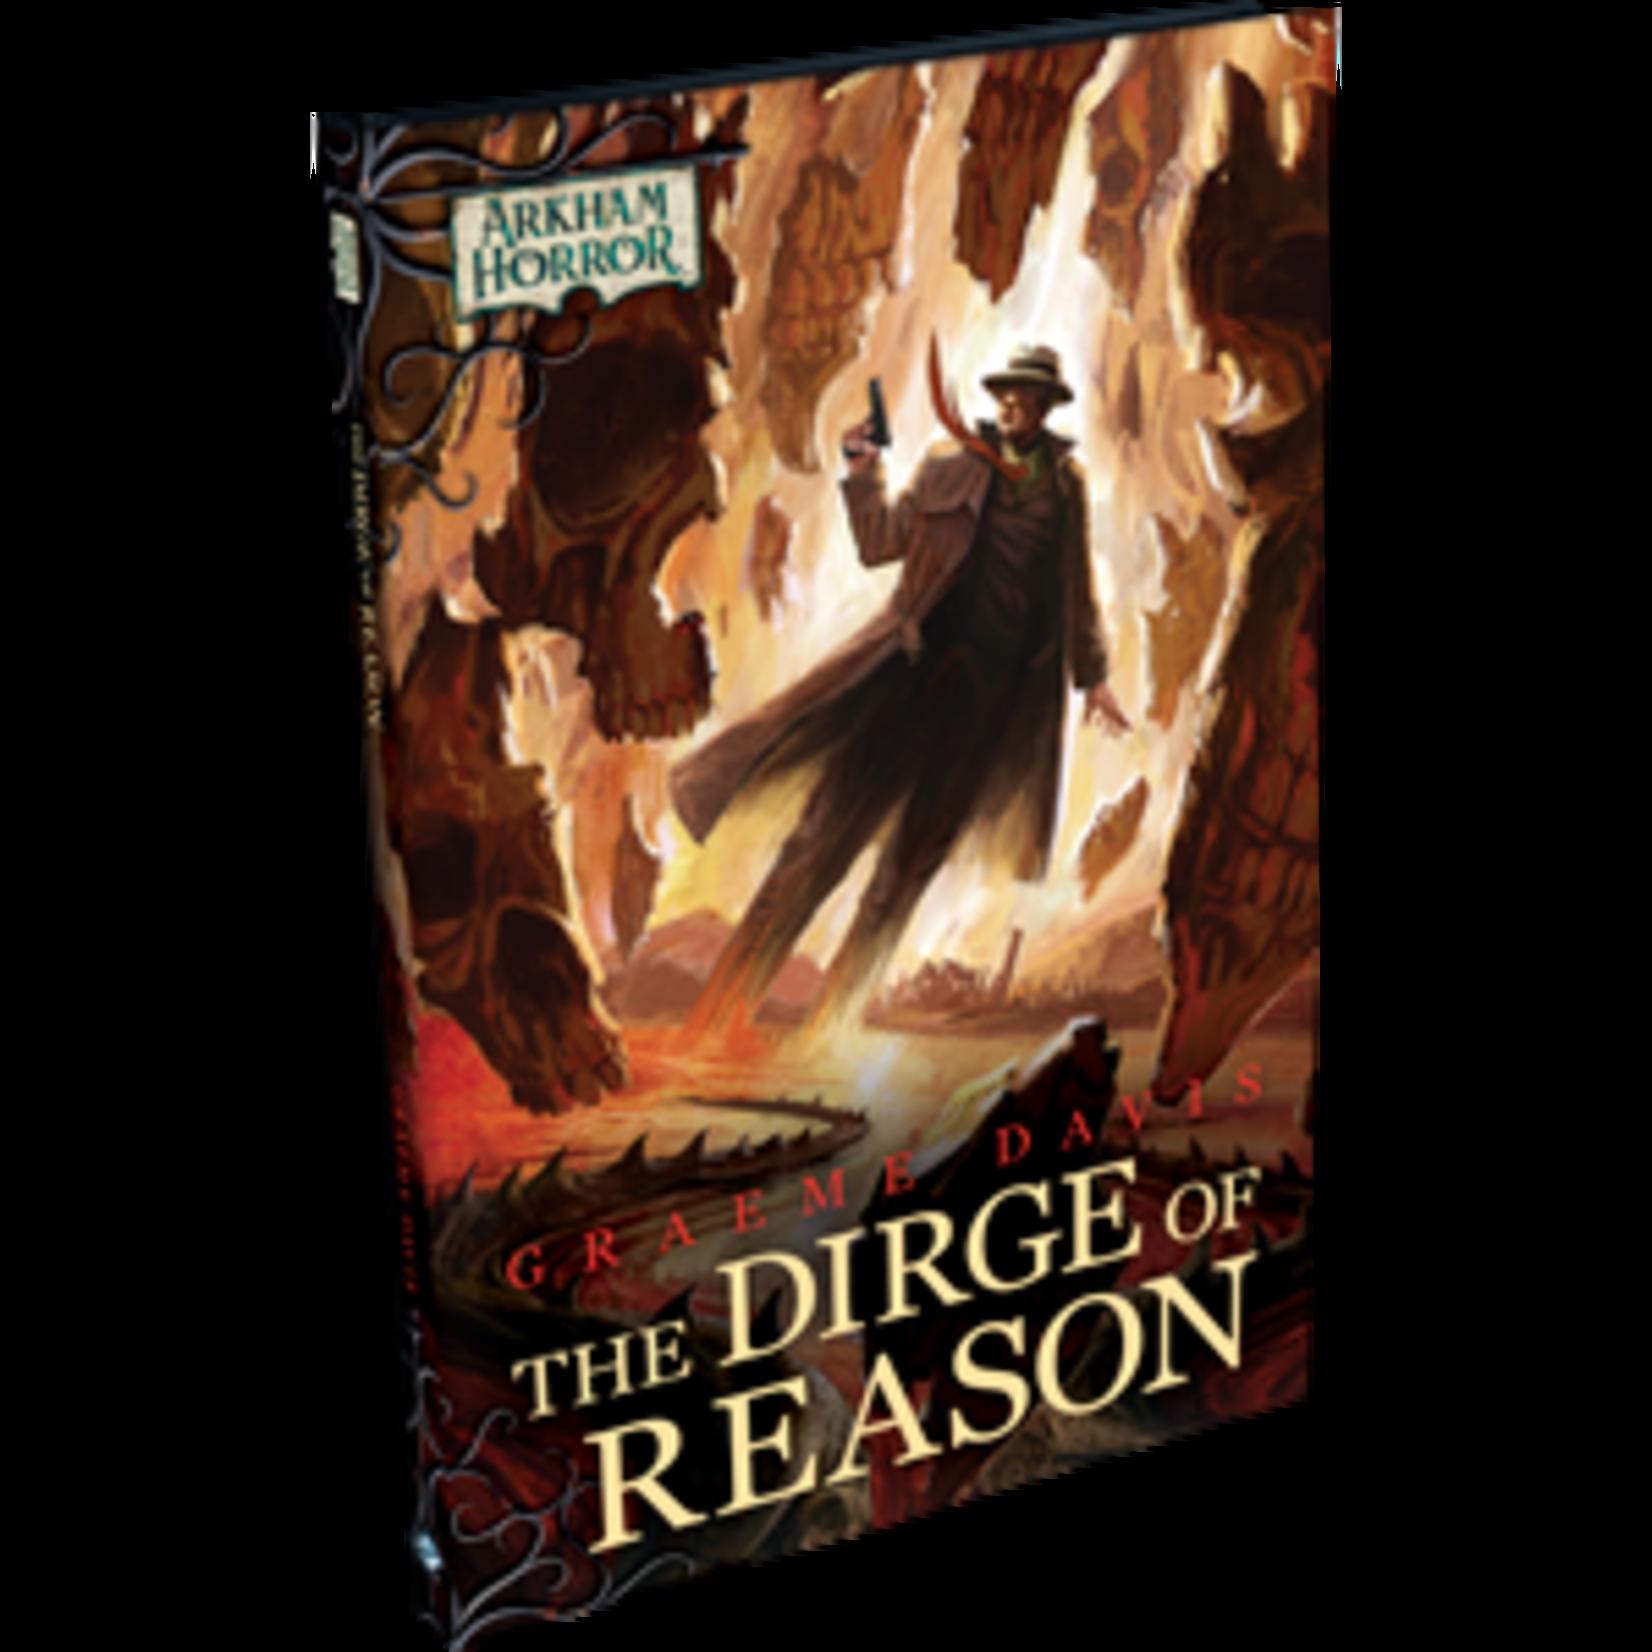 Fantasy Flight Games Arkham Horror Novella: The Dirge of Reason